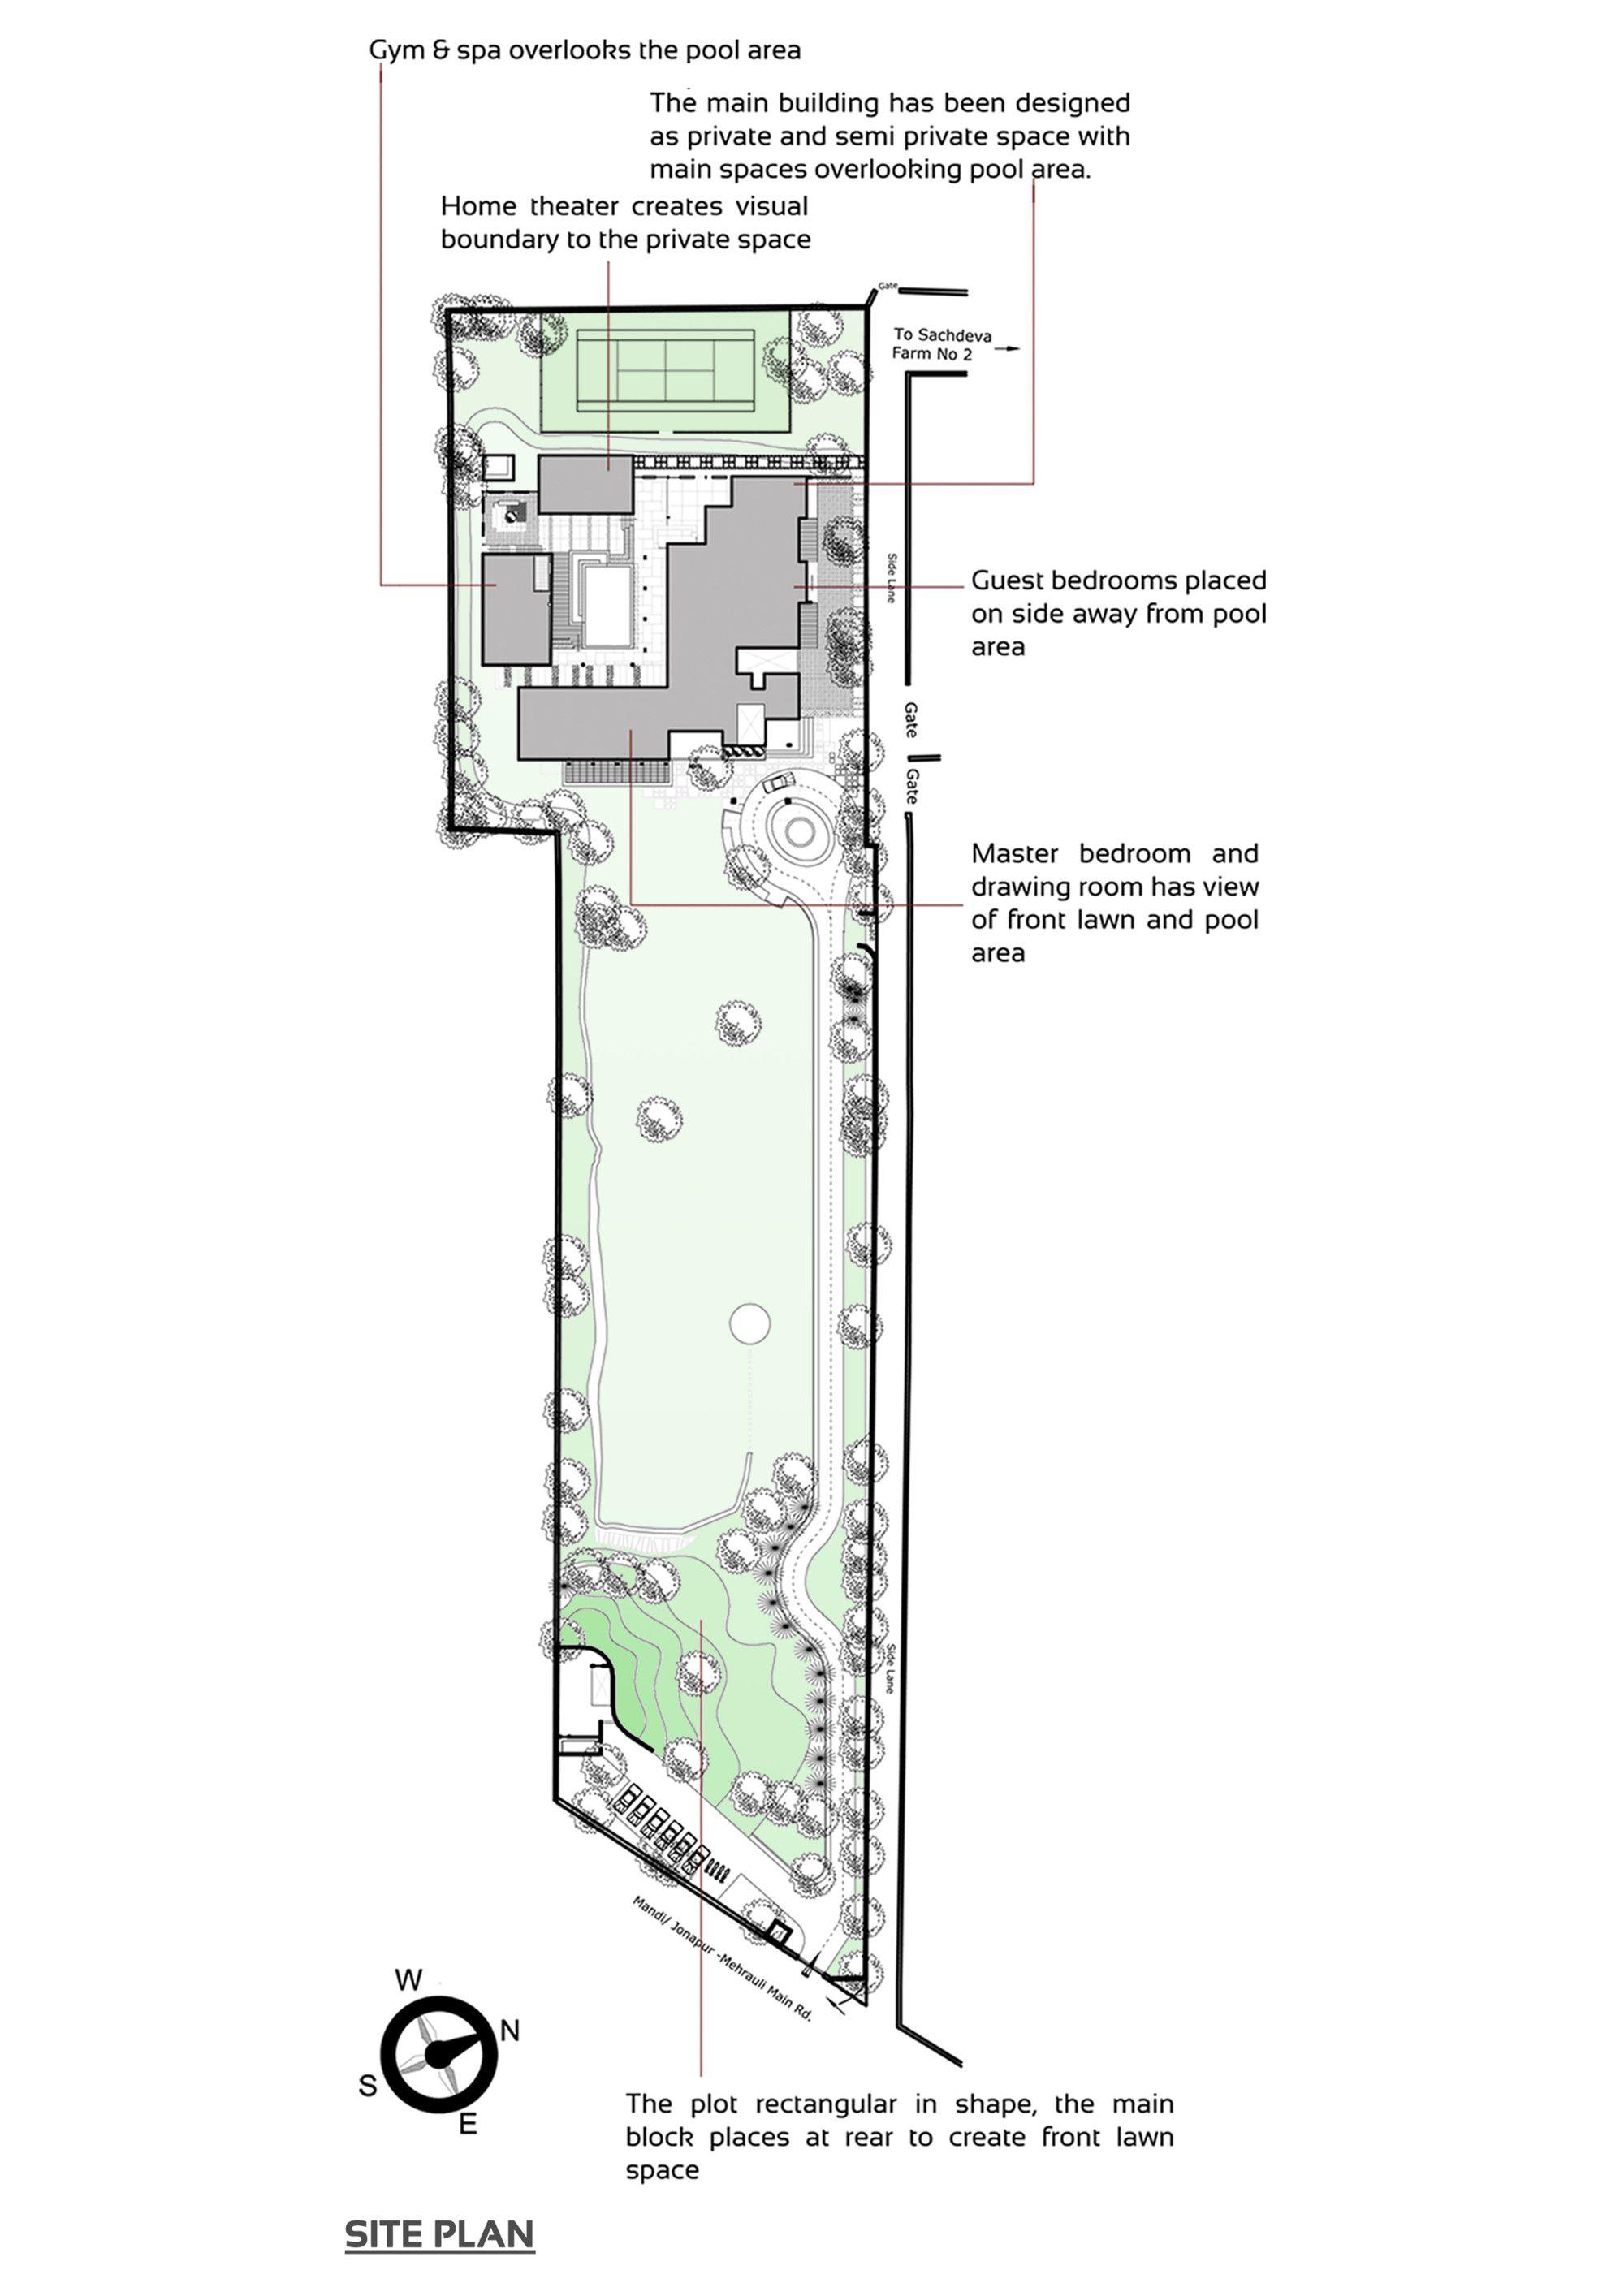 Galeria De Casa De Campo Sachdeva Spaces Architects Ka 16 Architect Site Plan Ground Floor Plan